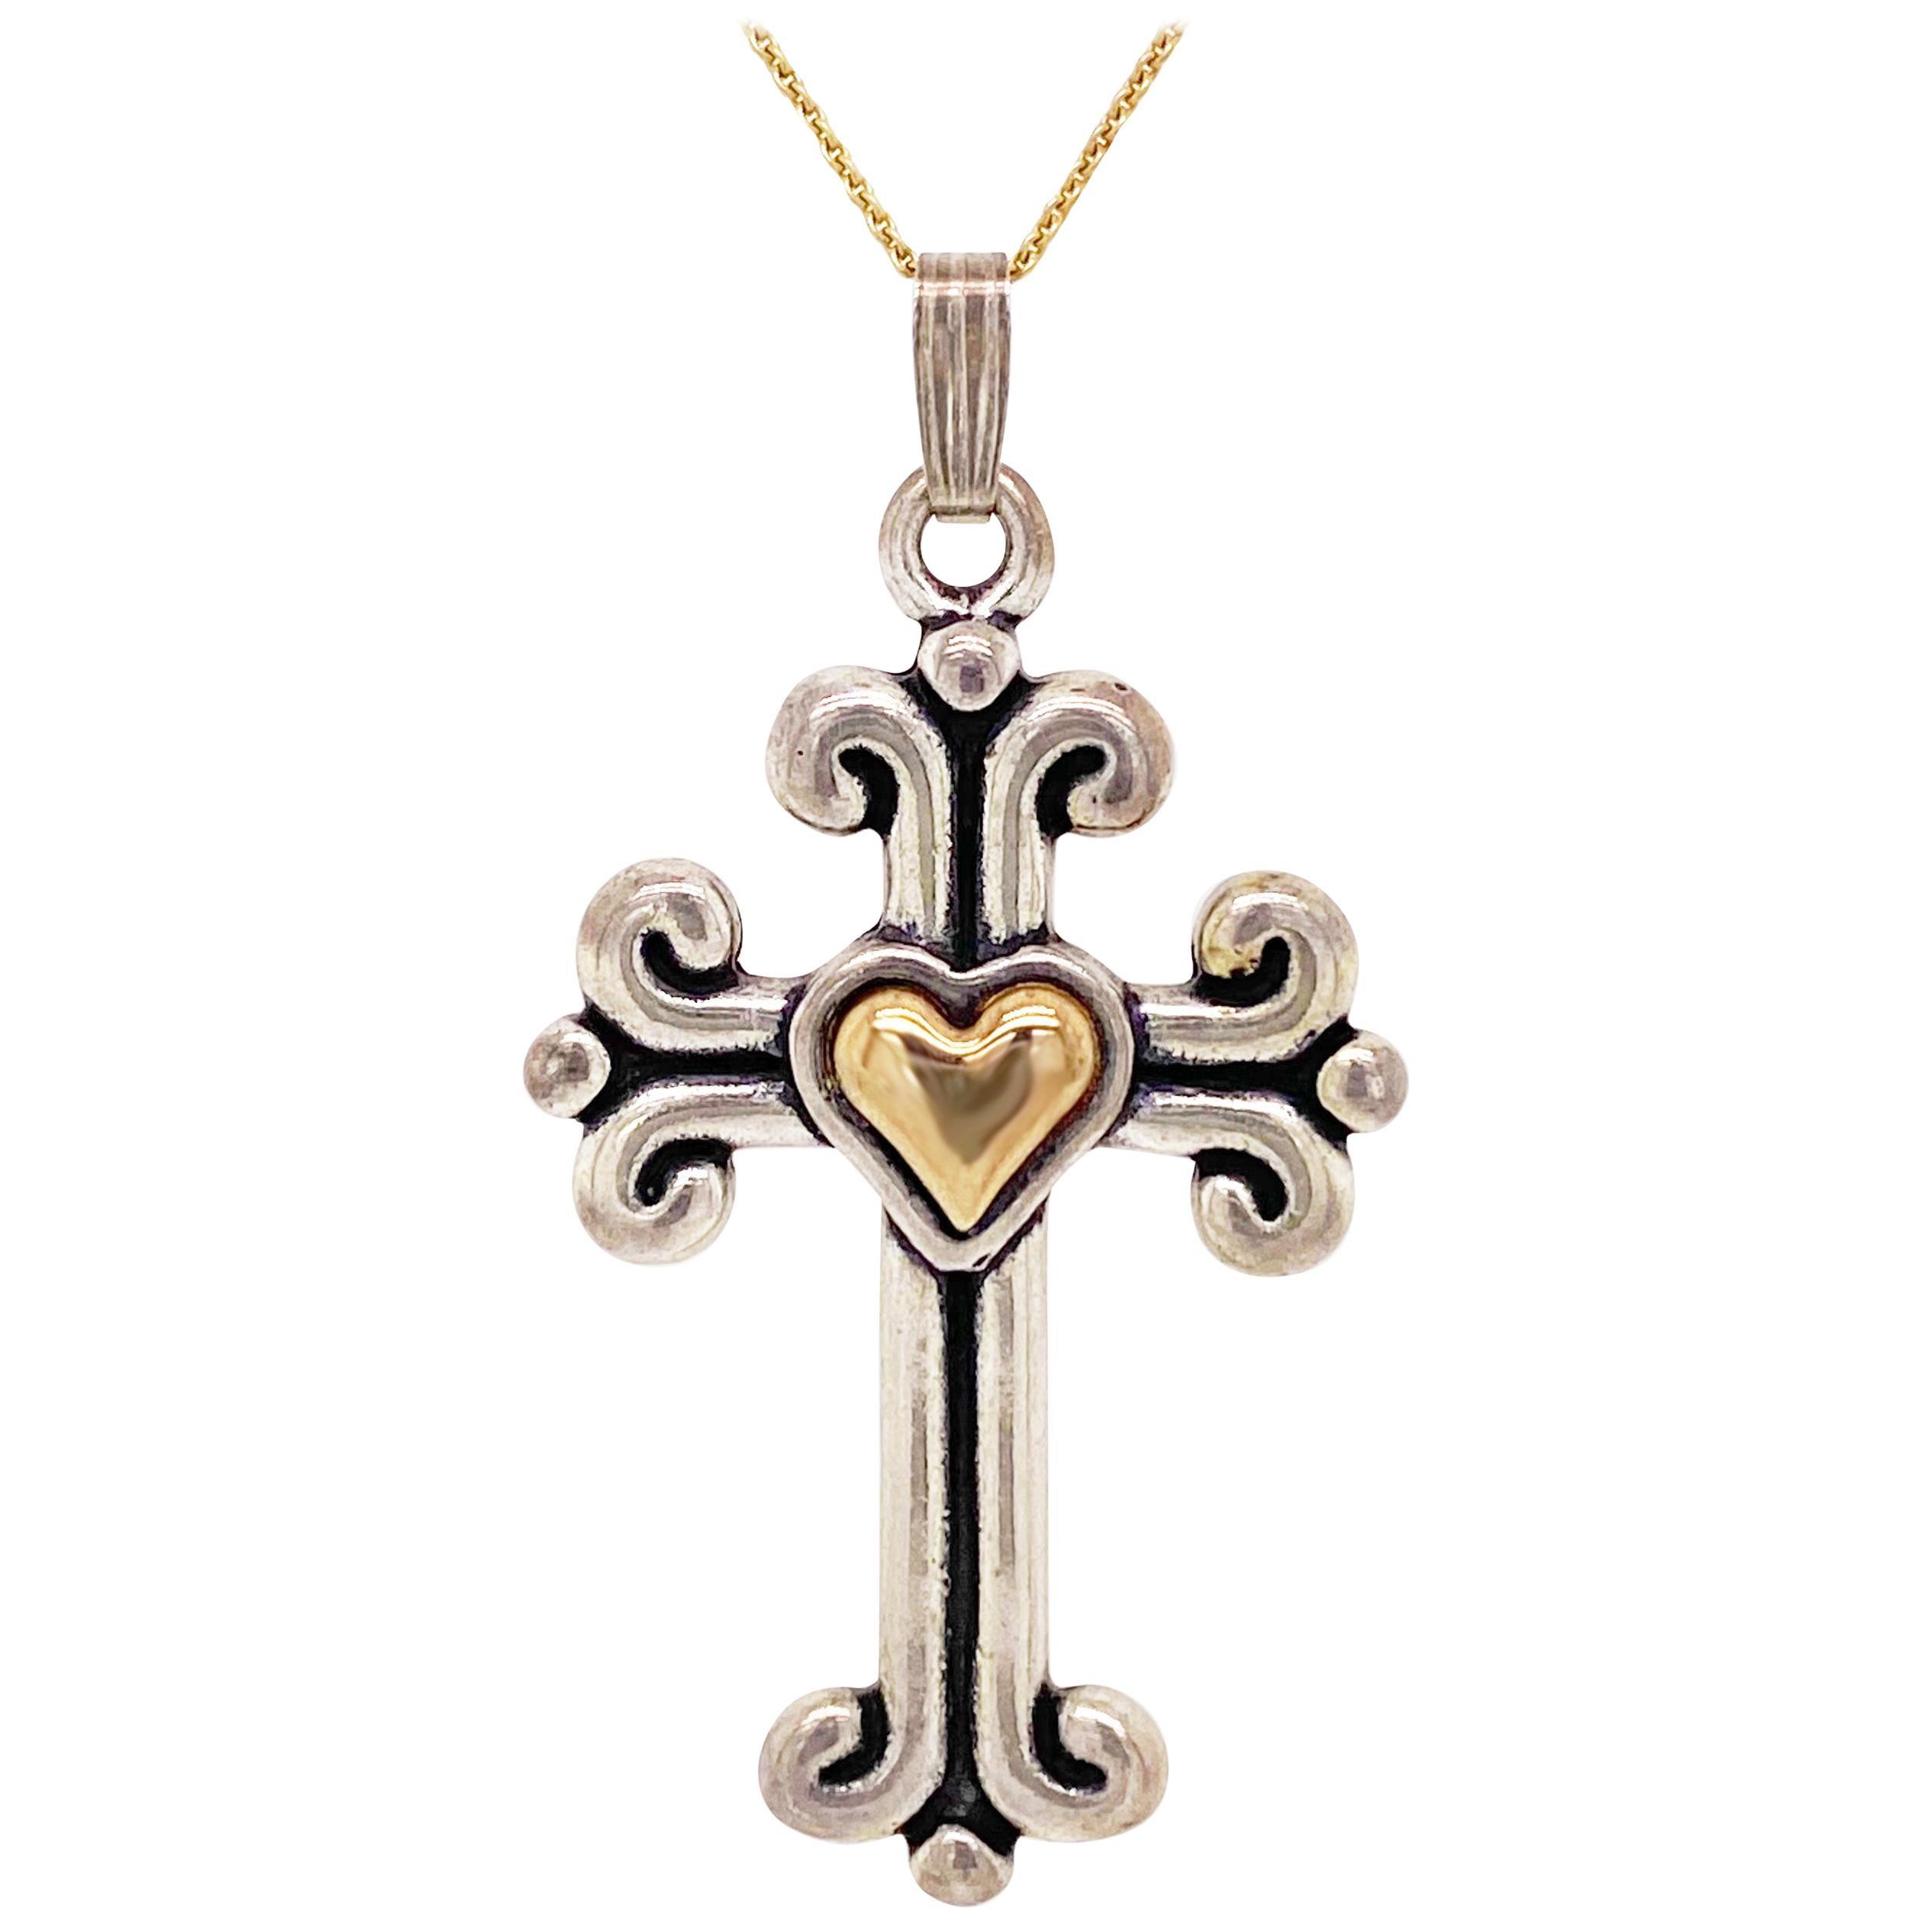 Cross Heart Necklace, 14 Karat Gold, Sterling Silver, Mixed Metal, Faith Love